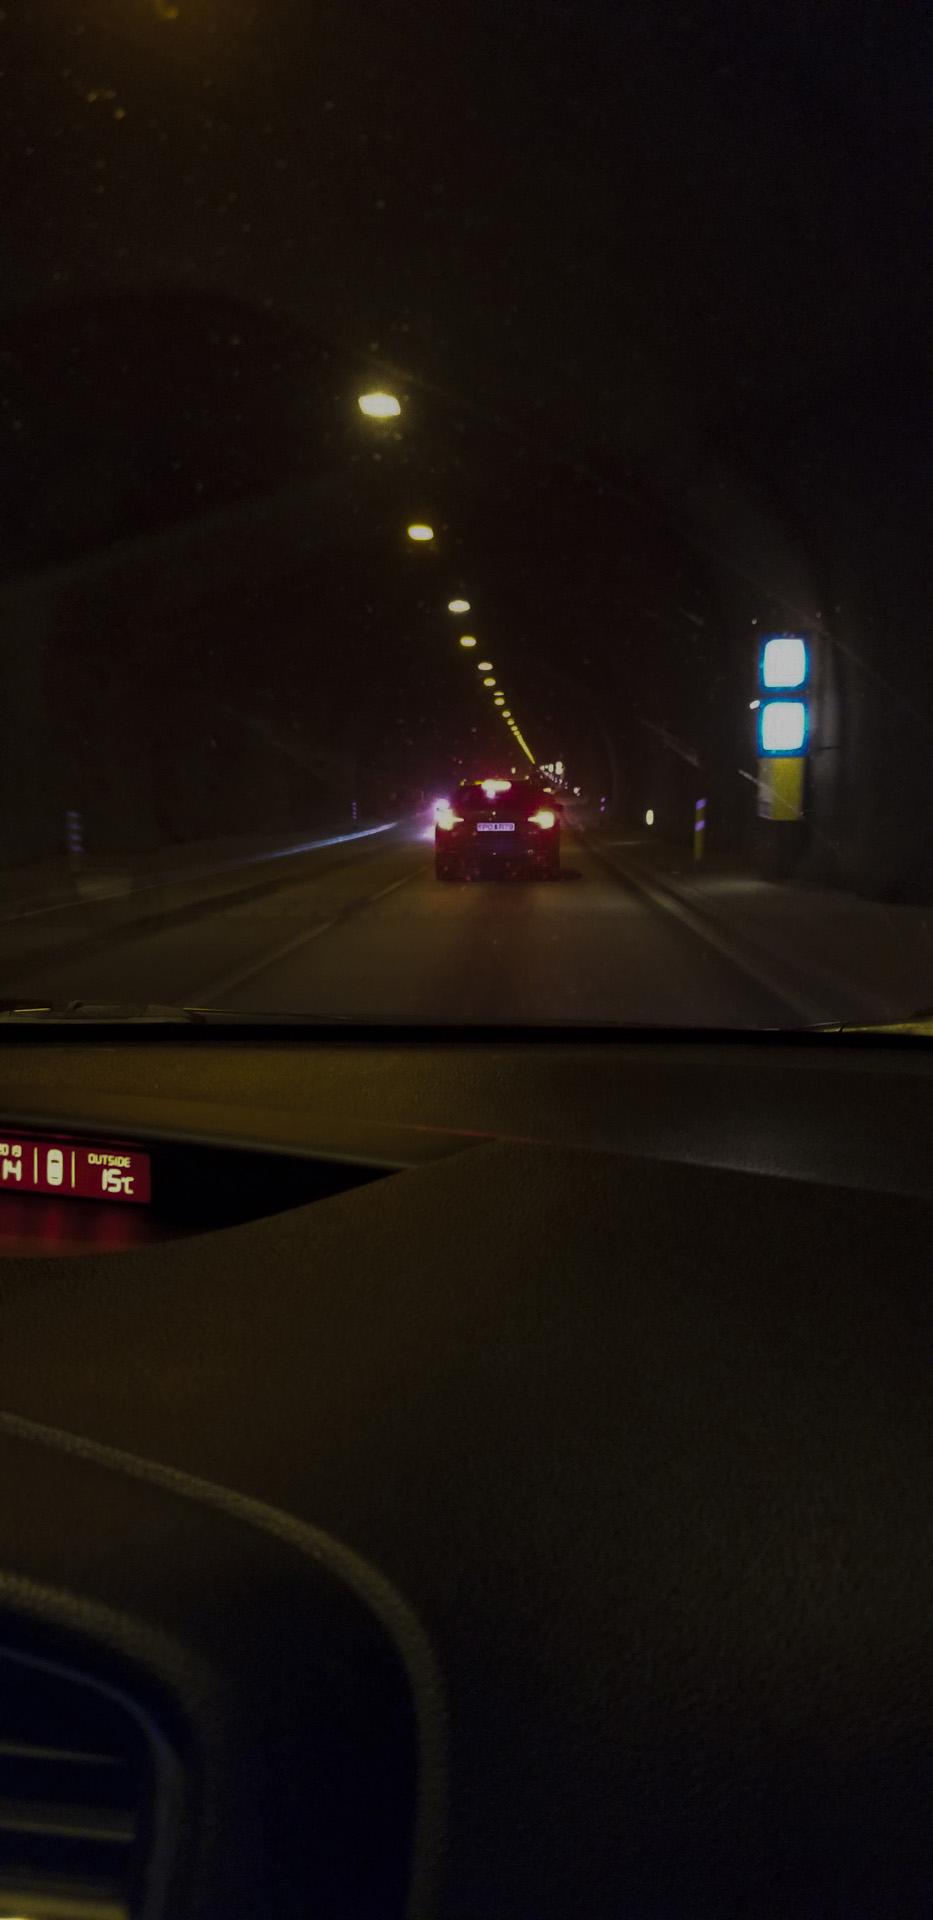 Driving through Hvalfjarðargöng, the tunnel that runs more than 3.5 miles (5.7km) under Hvalfjörður (Whale Fjord), Capital region, Iceland.